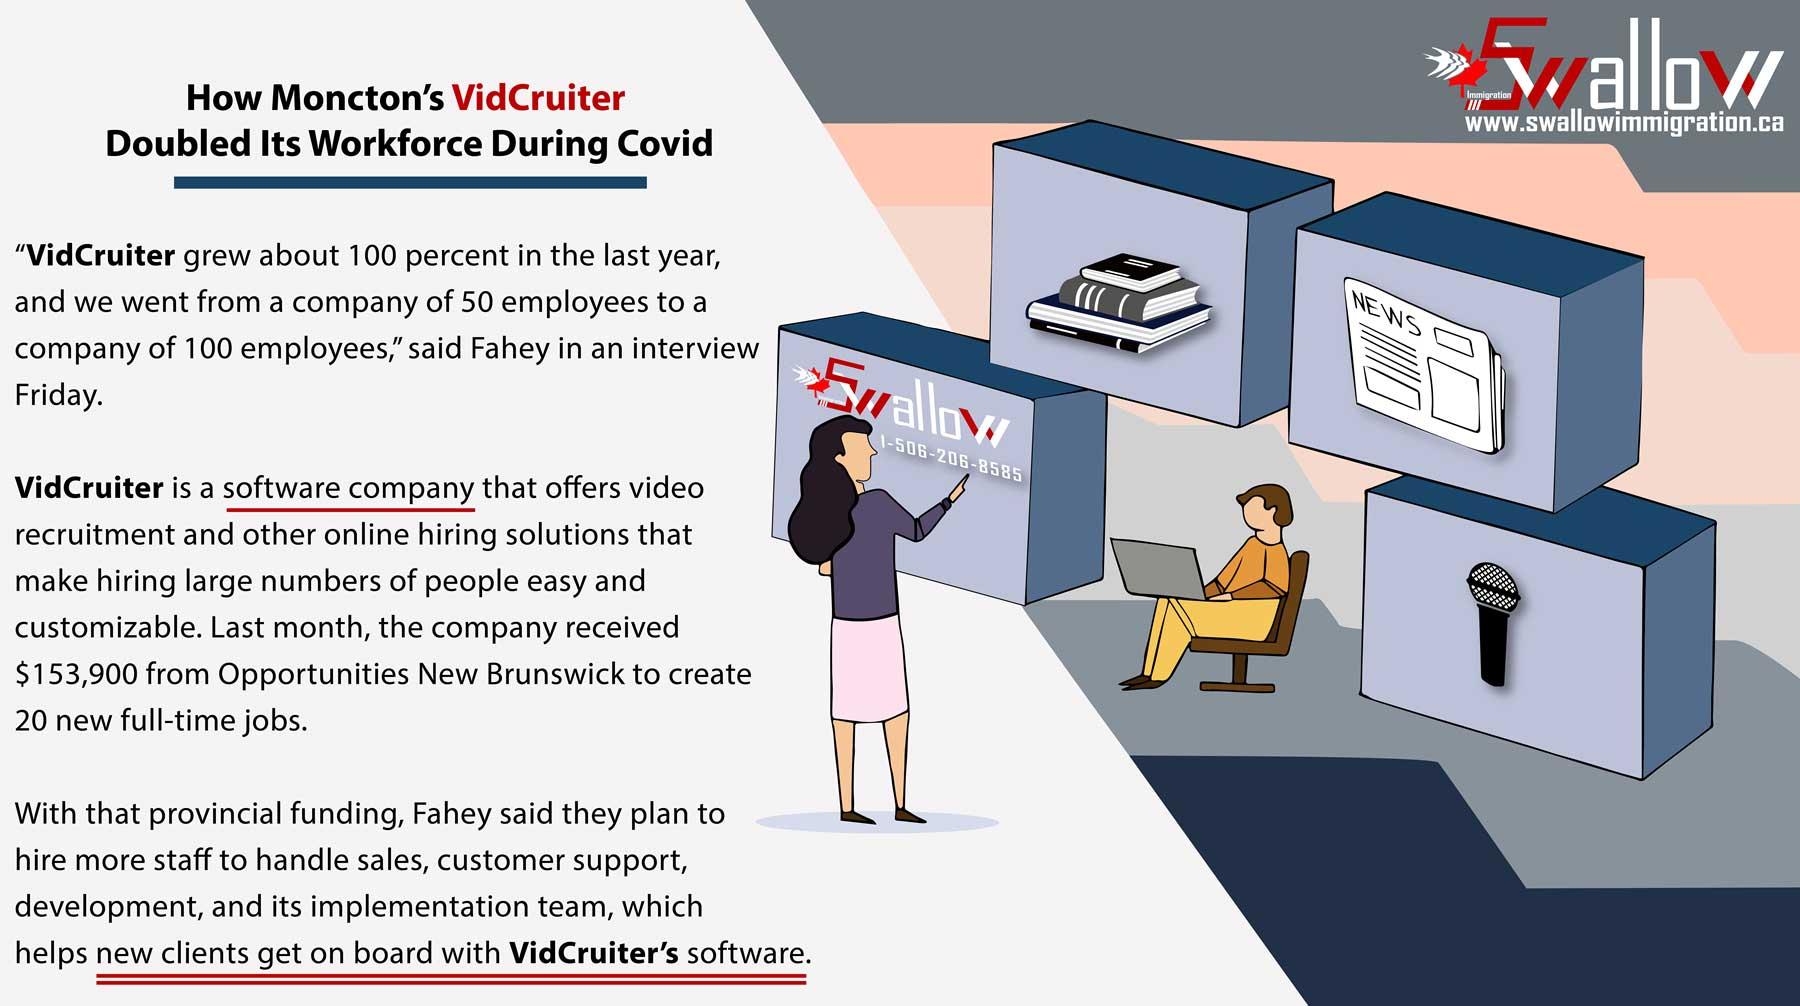 Moncton's VidCruiter